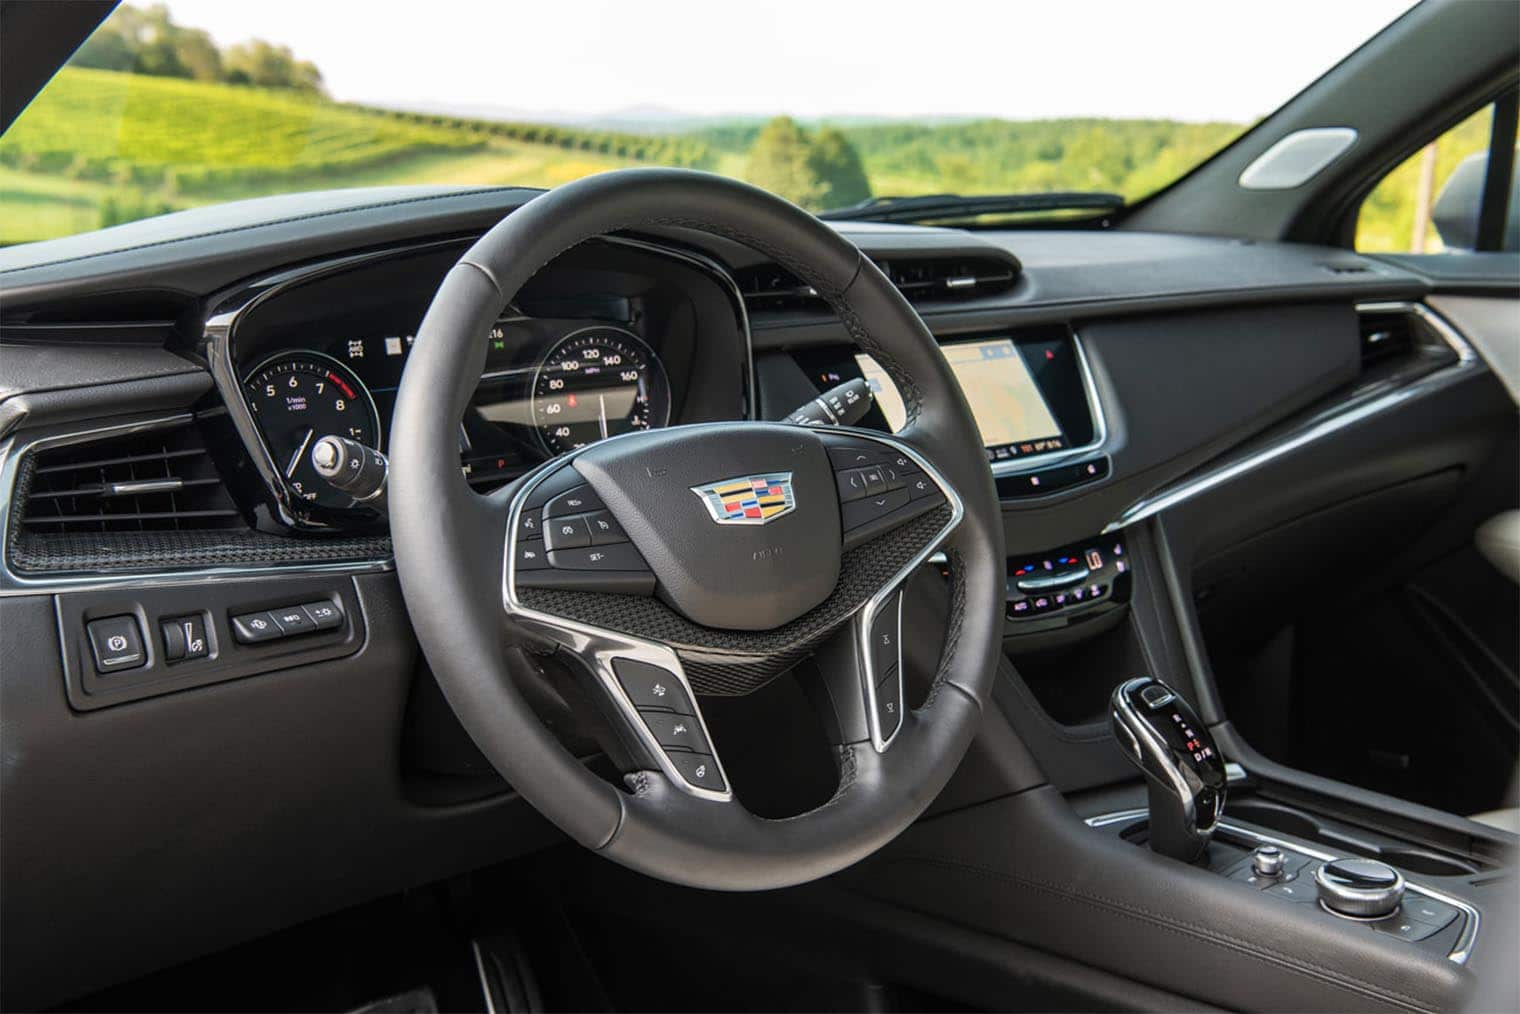 First Look: 2020 Cadillac XT5 | TheDetroitBureau com